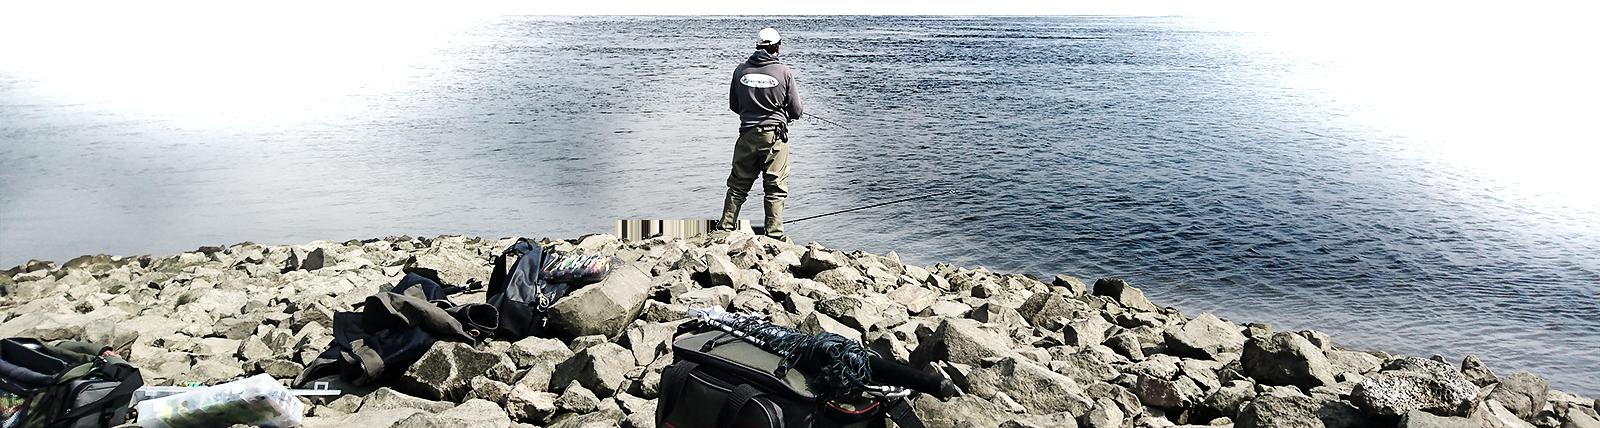 Angler auf der Buhne